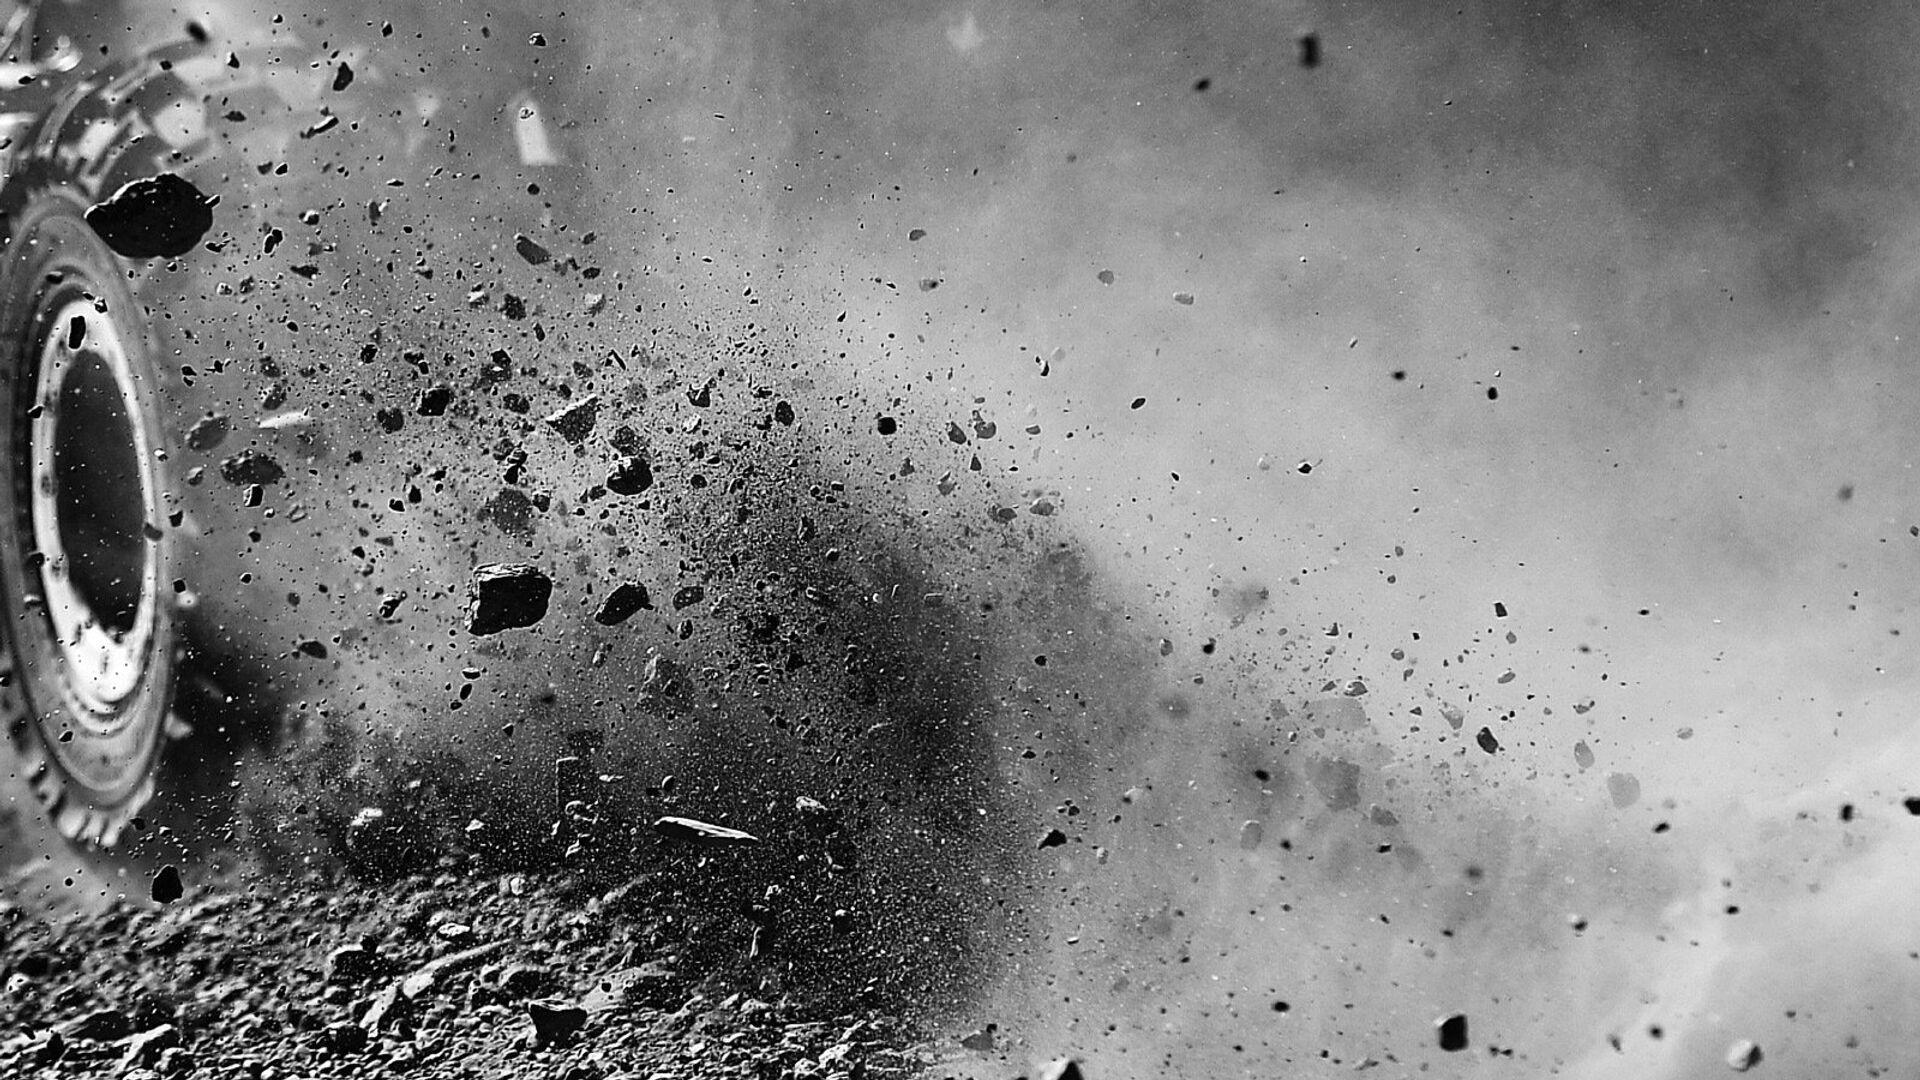 Квадроцикл на восьмом этапе ралли Дакар в Аргентине - РИА Новости, 1920, 02.07.2021